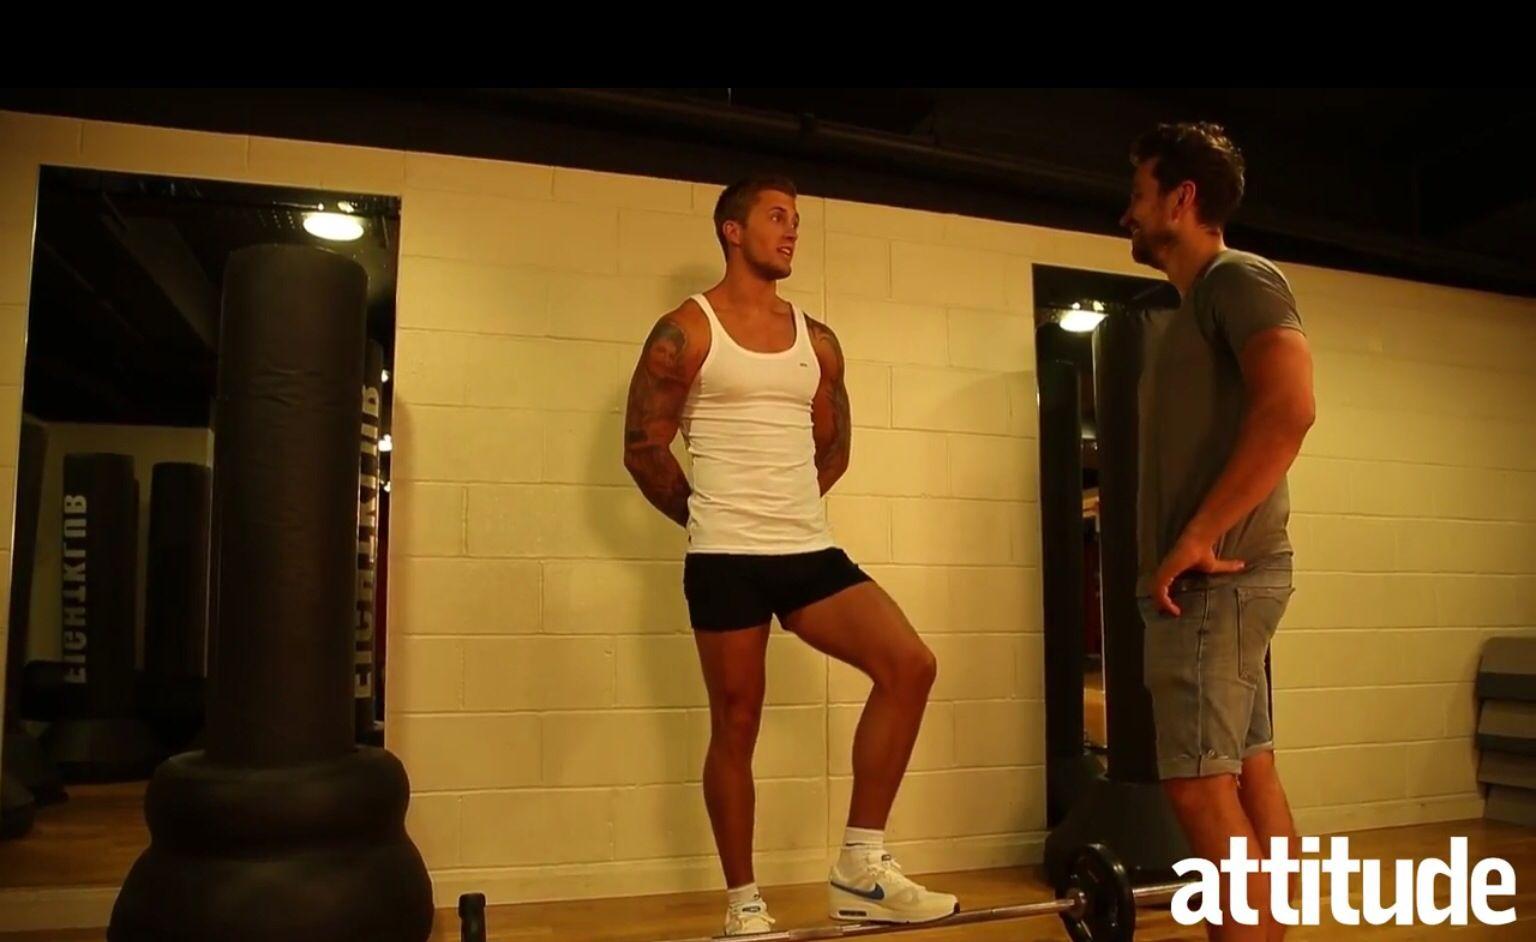 Dan Osbourne is the new fitness guru for Attitude magazine